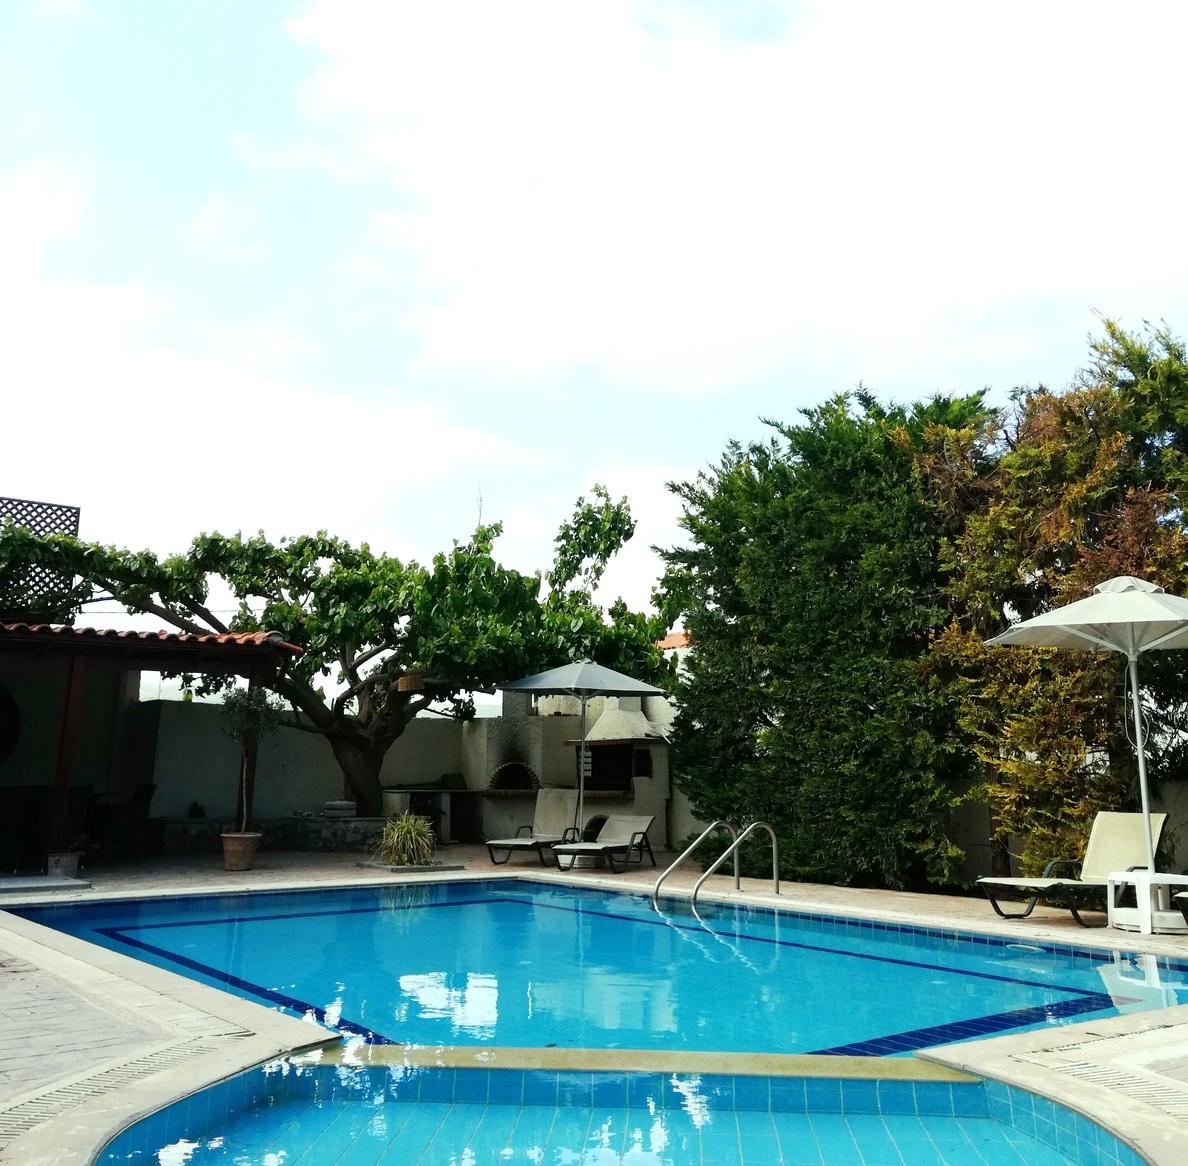 Swimmingpools and a shady patio at the Private Villa